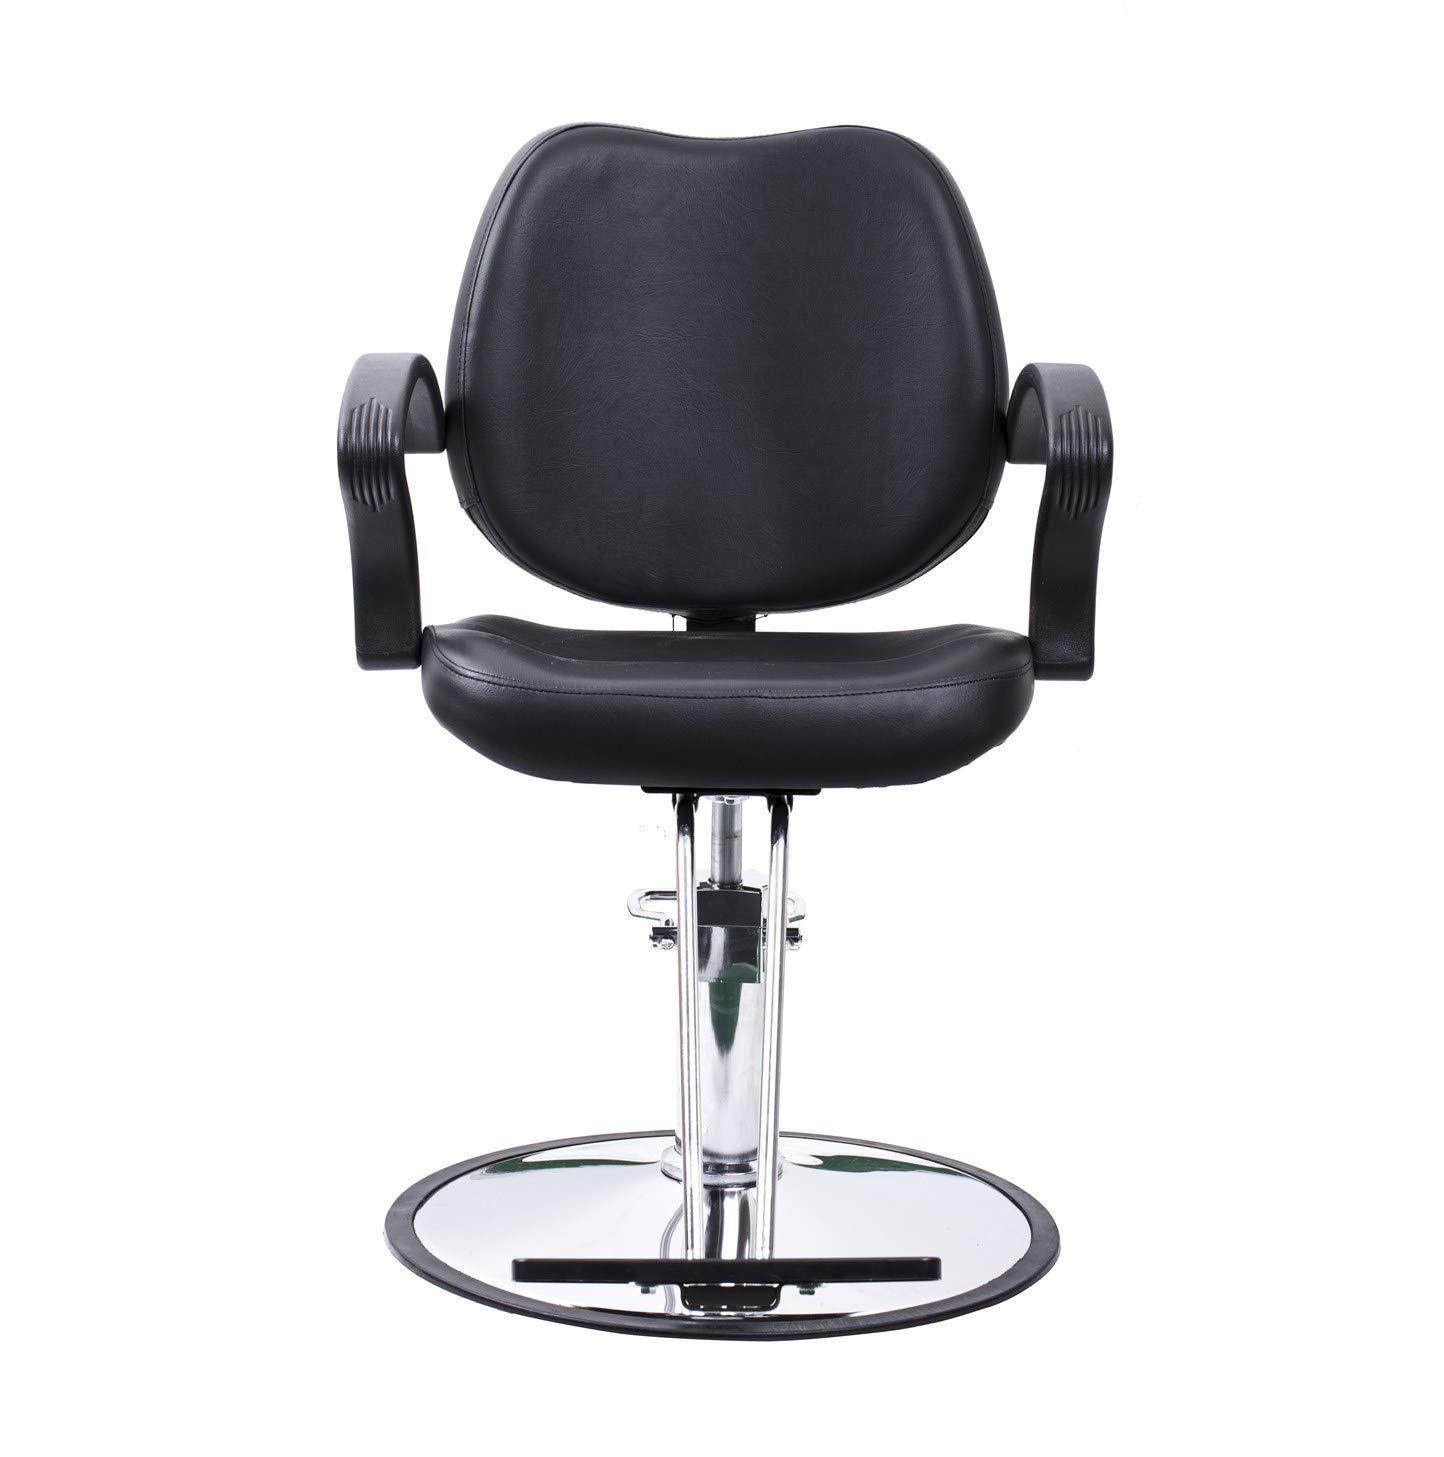 Salon Style Cutting Styling Beauty Salon Furniture Barber Chair Salon Chair for Hair Stylist Heavy Duty Tattoo Chair